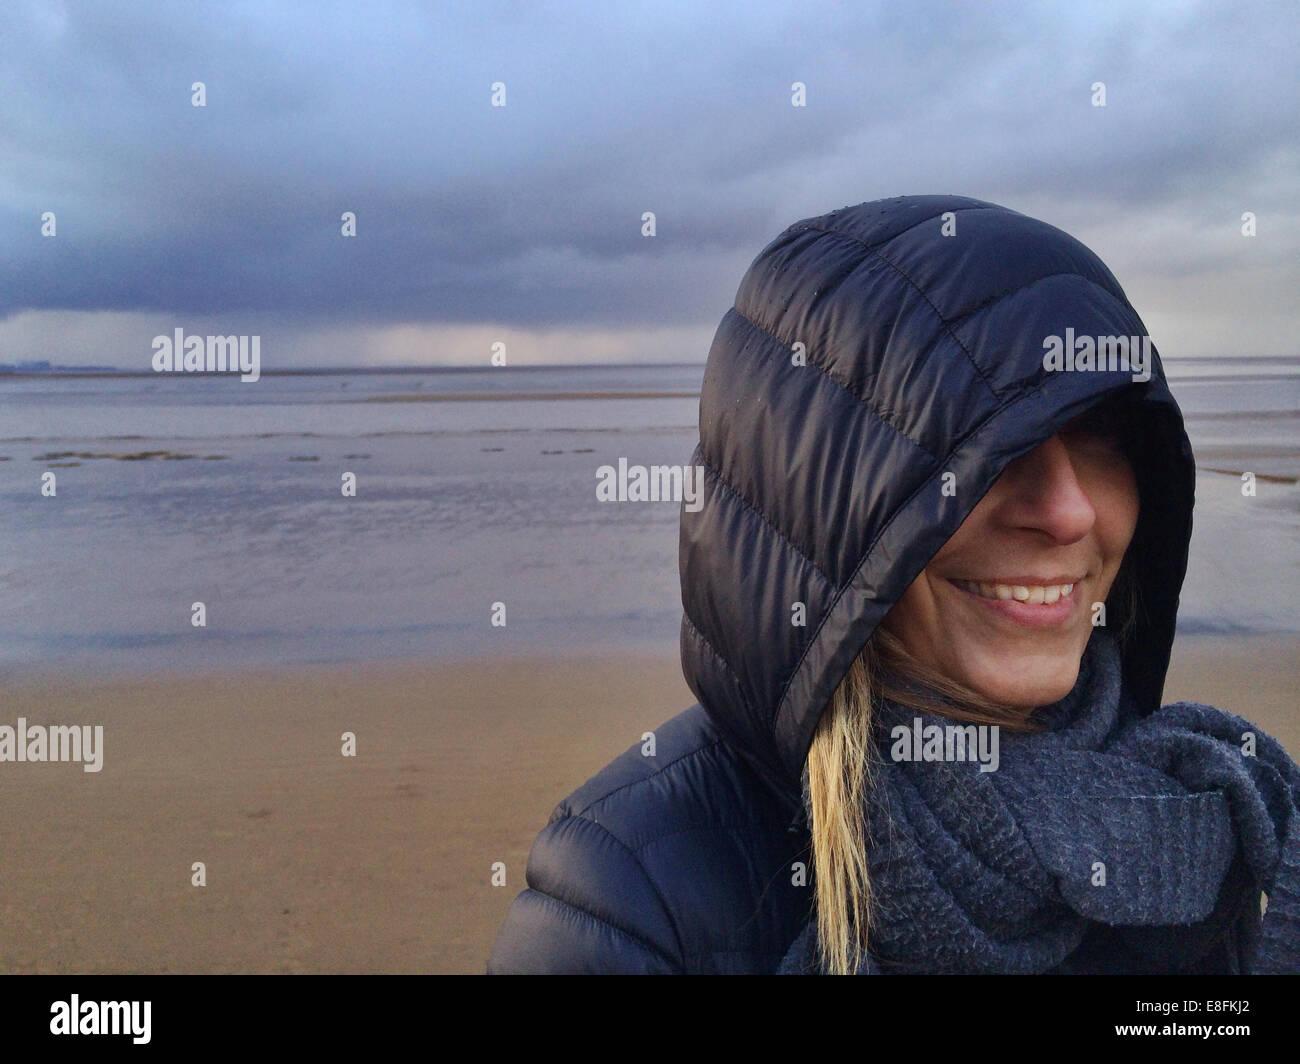 Somerset, Royaume-Uni Smiling Woman at Beach pendant un temps orageux Photo Stock